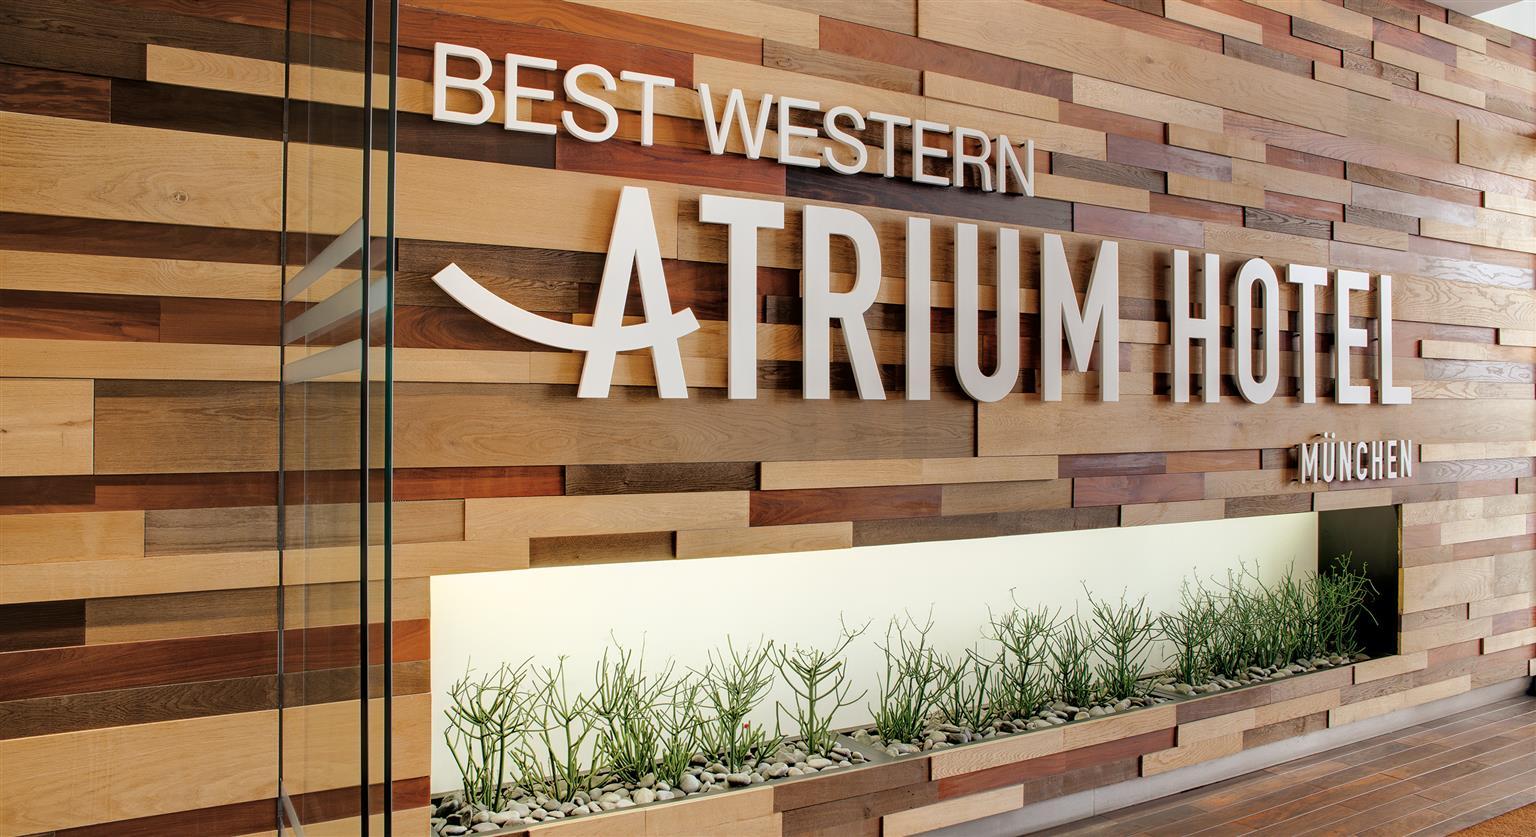 cazare la Best Western Atrium Hotel